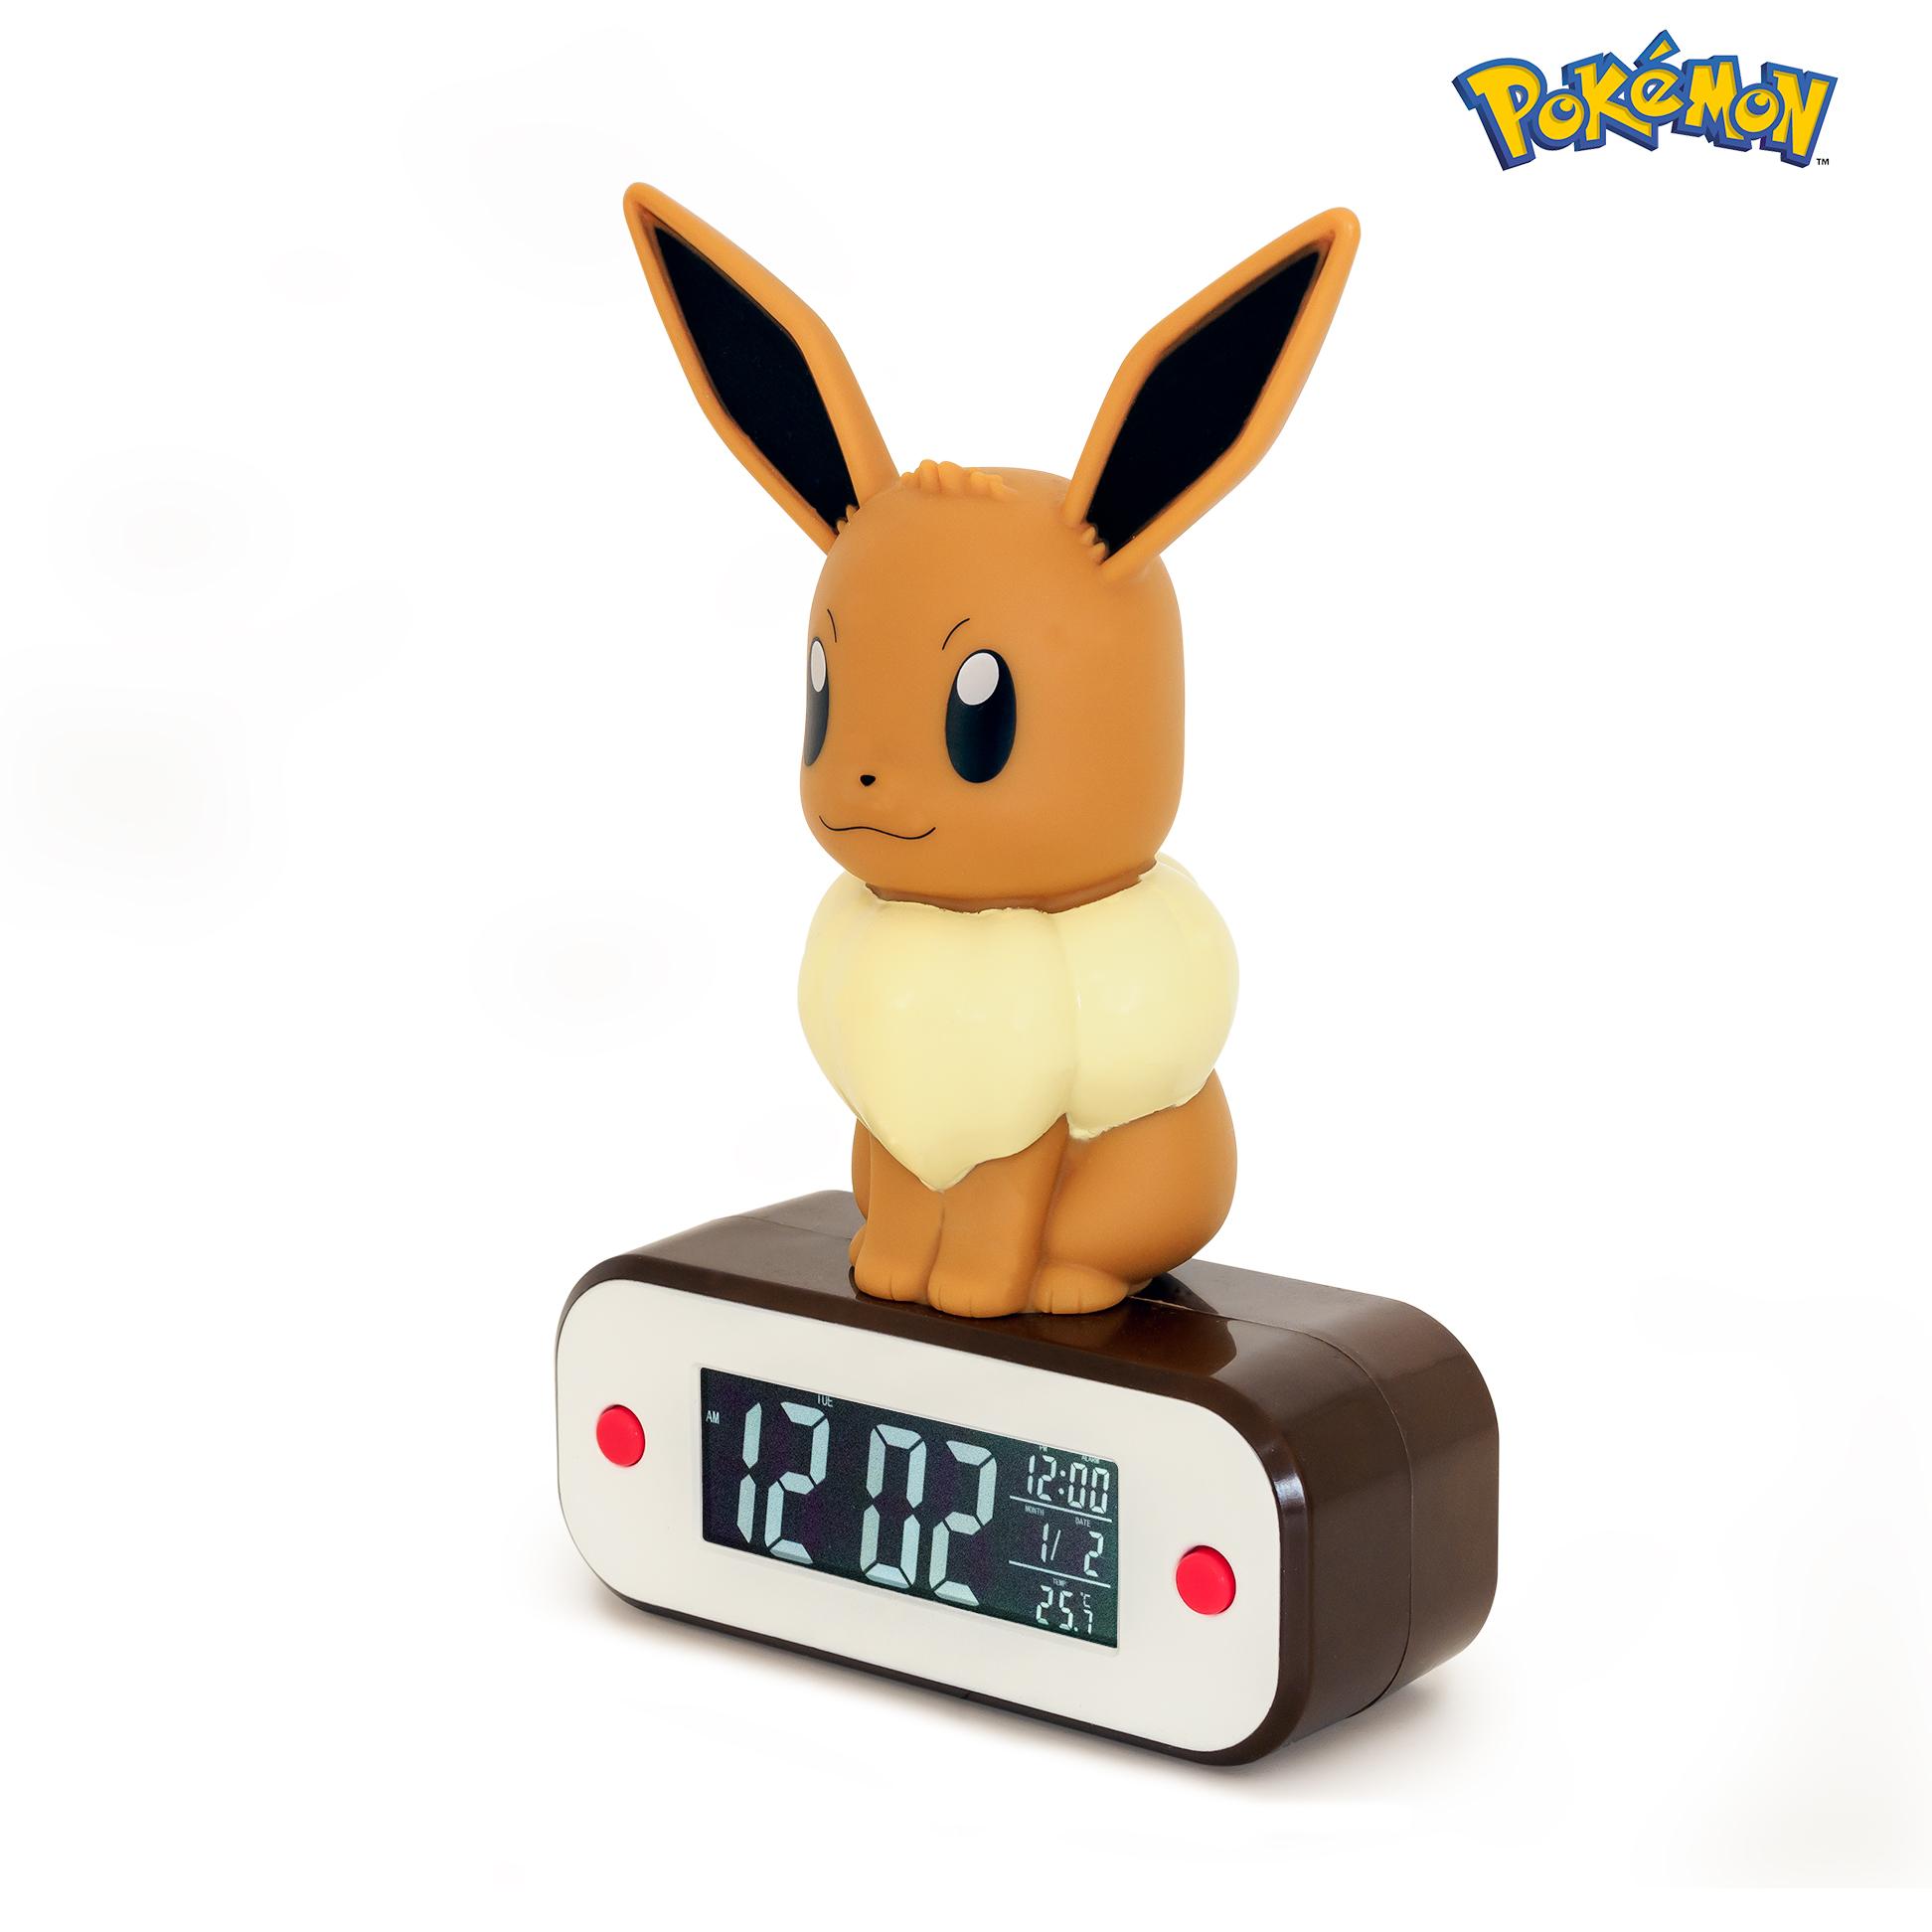 Numérique Pikachu Réveil Pokémon Radio Lumineux gyb6Y7fv